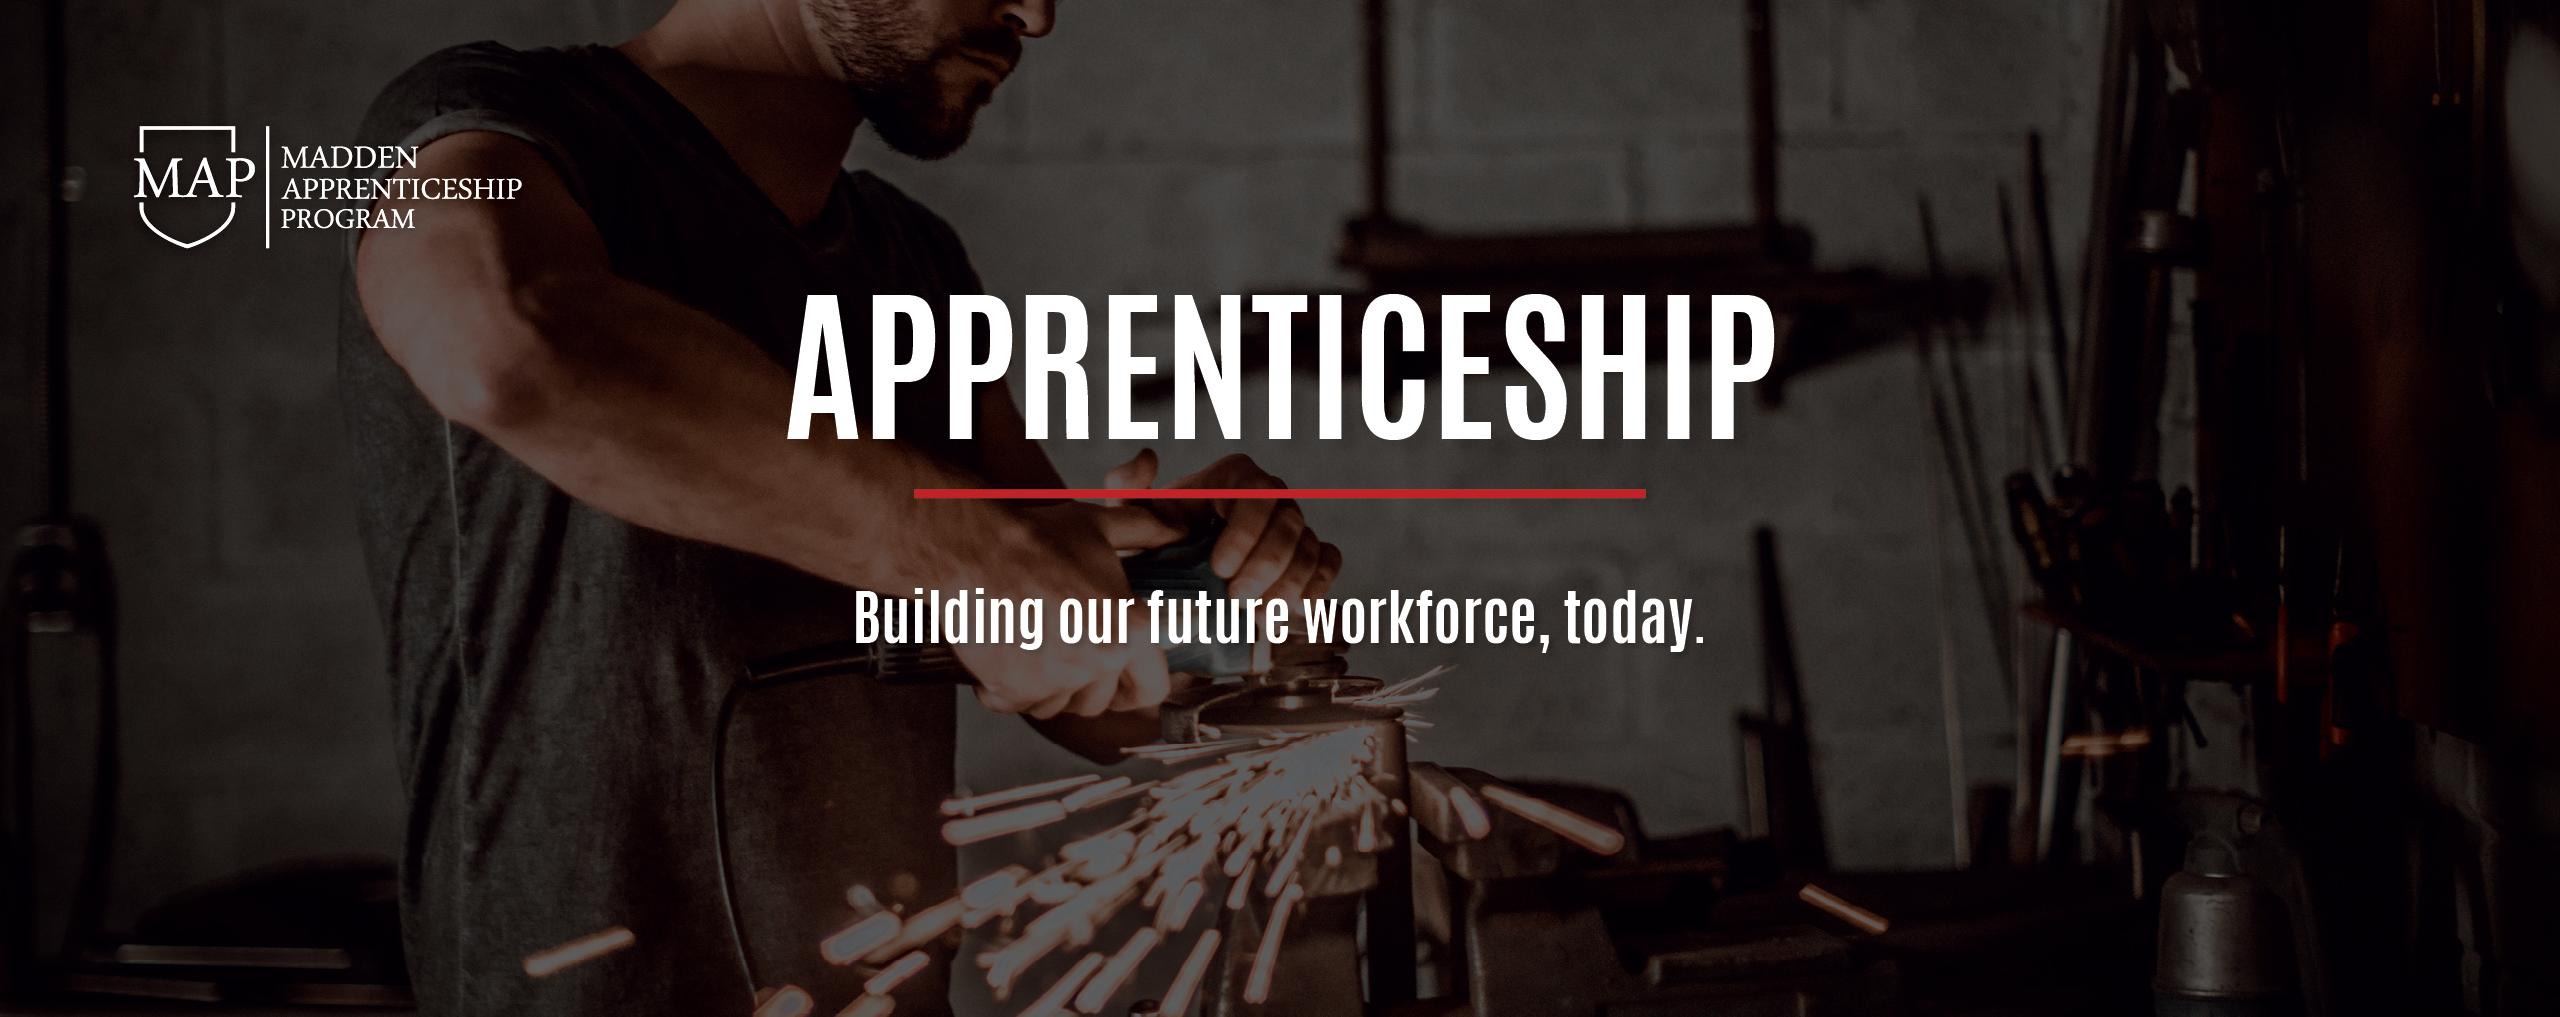 Apprenticeship page